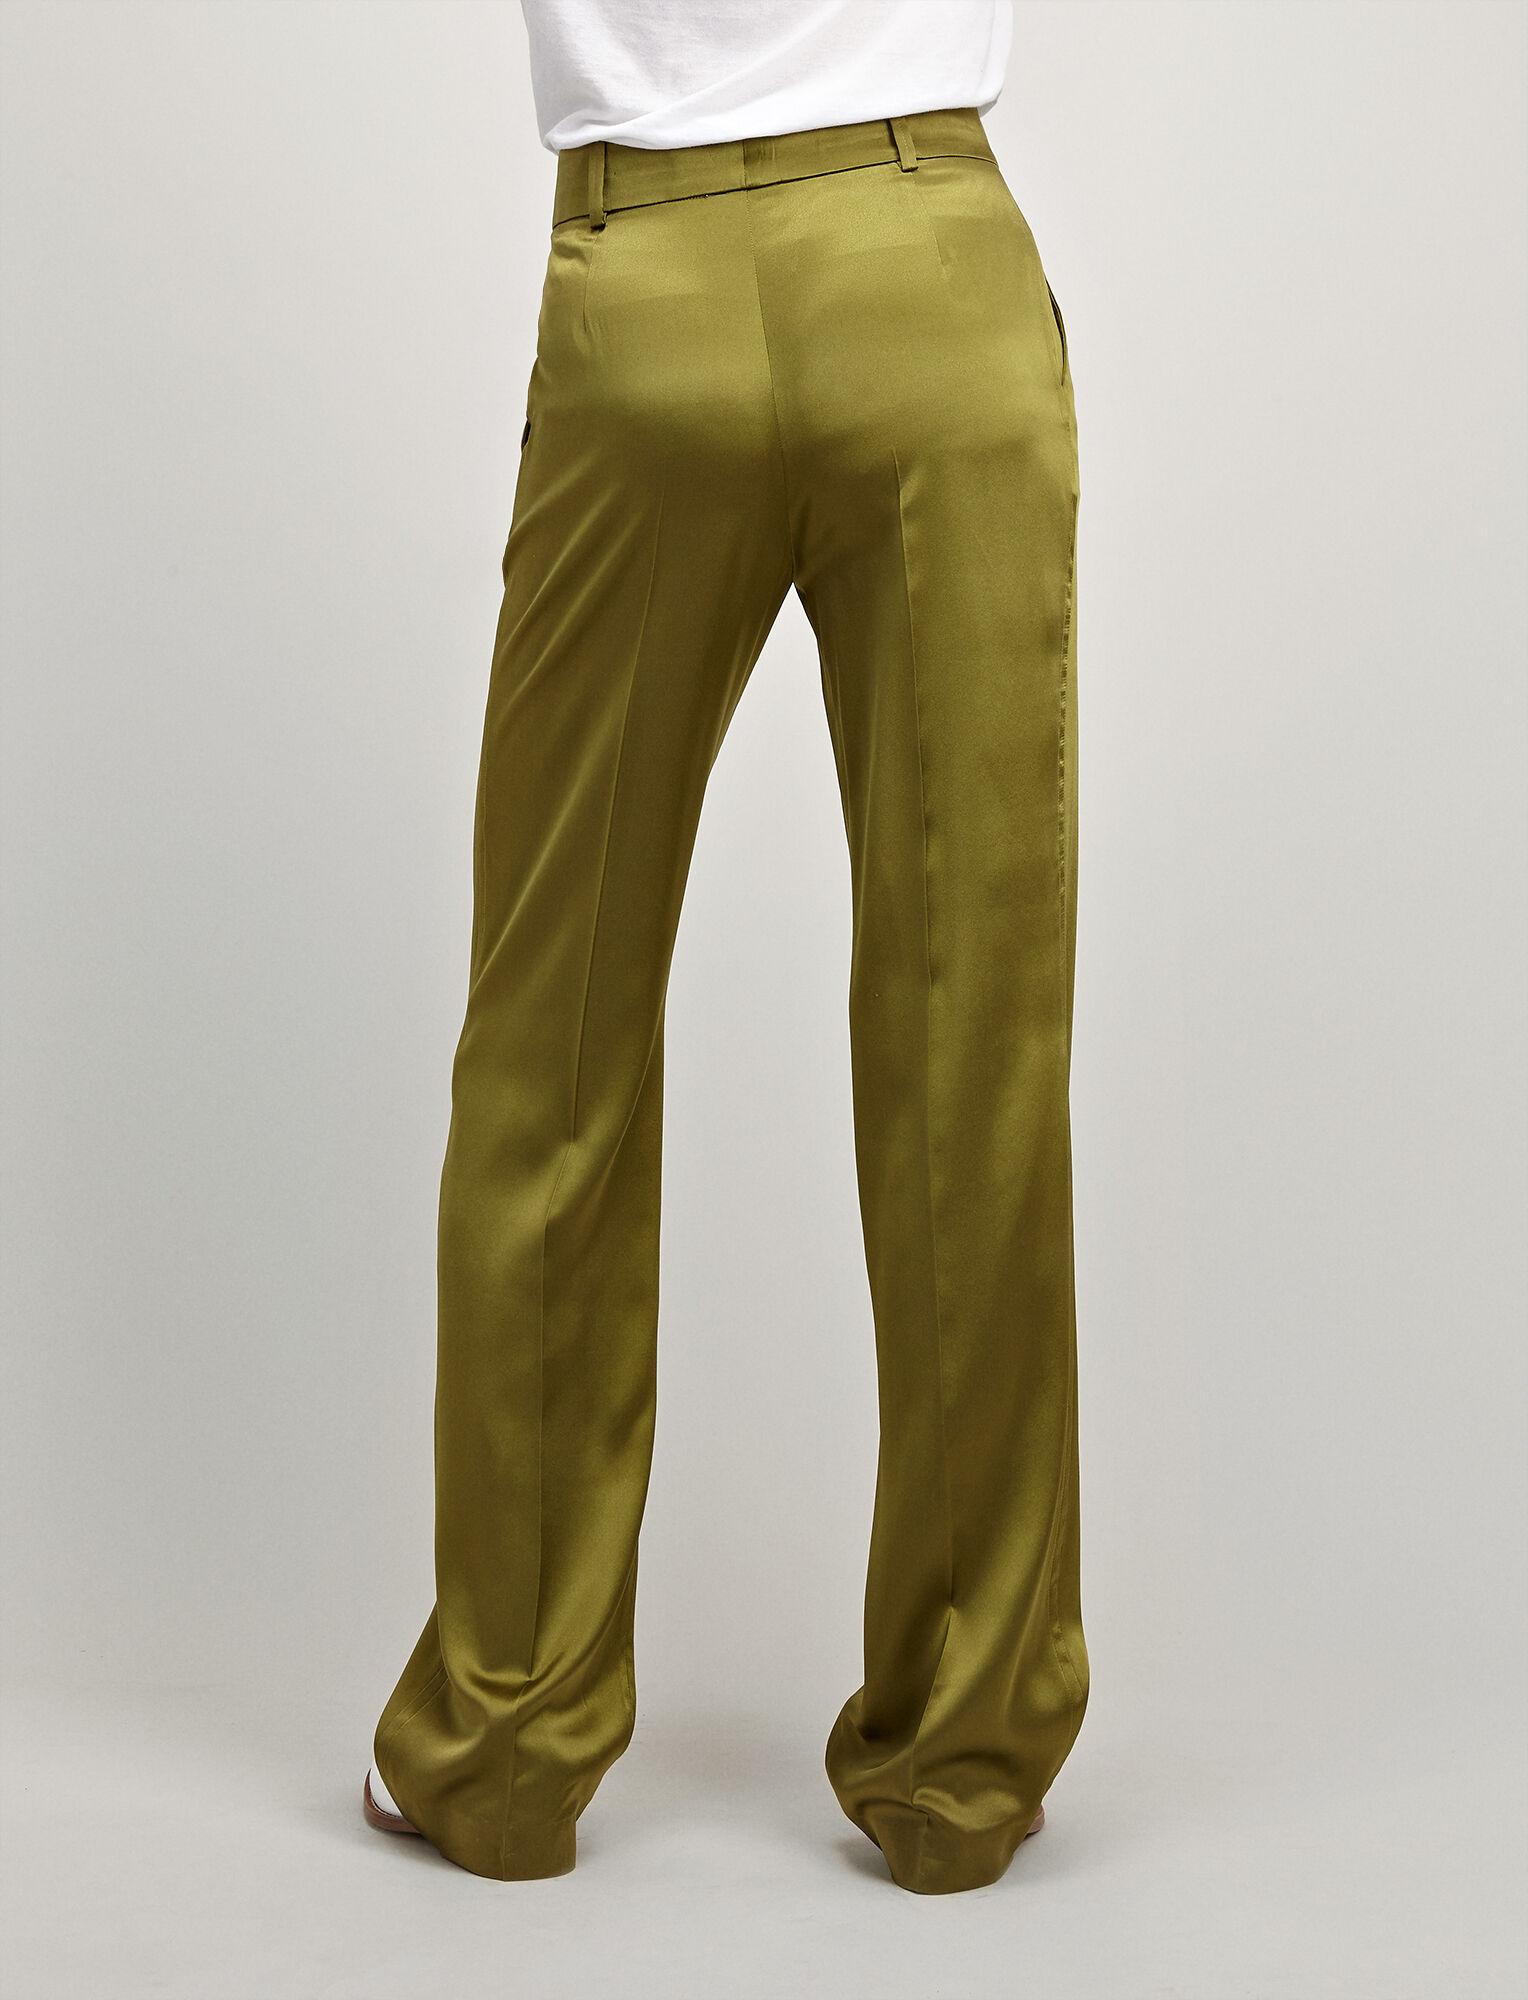 Joseph, Silk-Satin Ferdy Trousers, in PEA